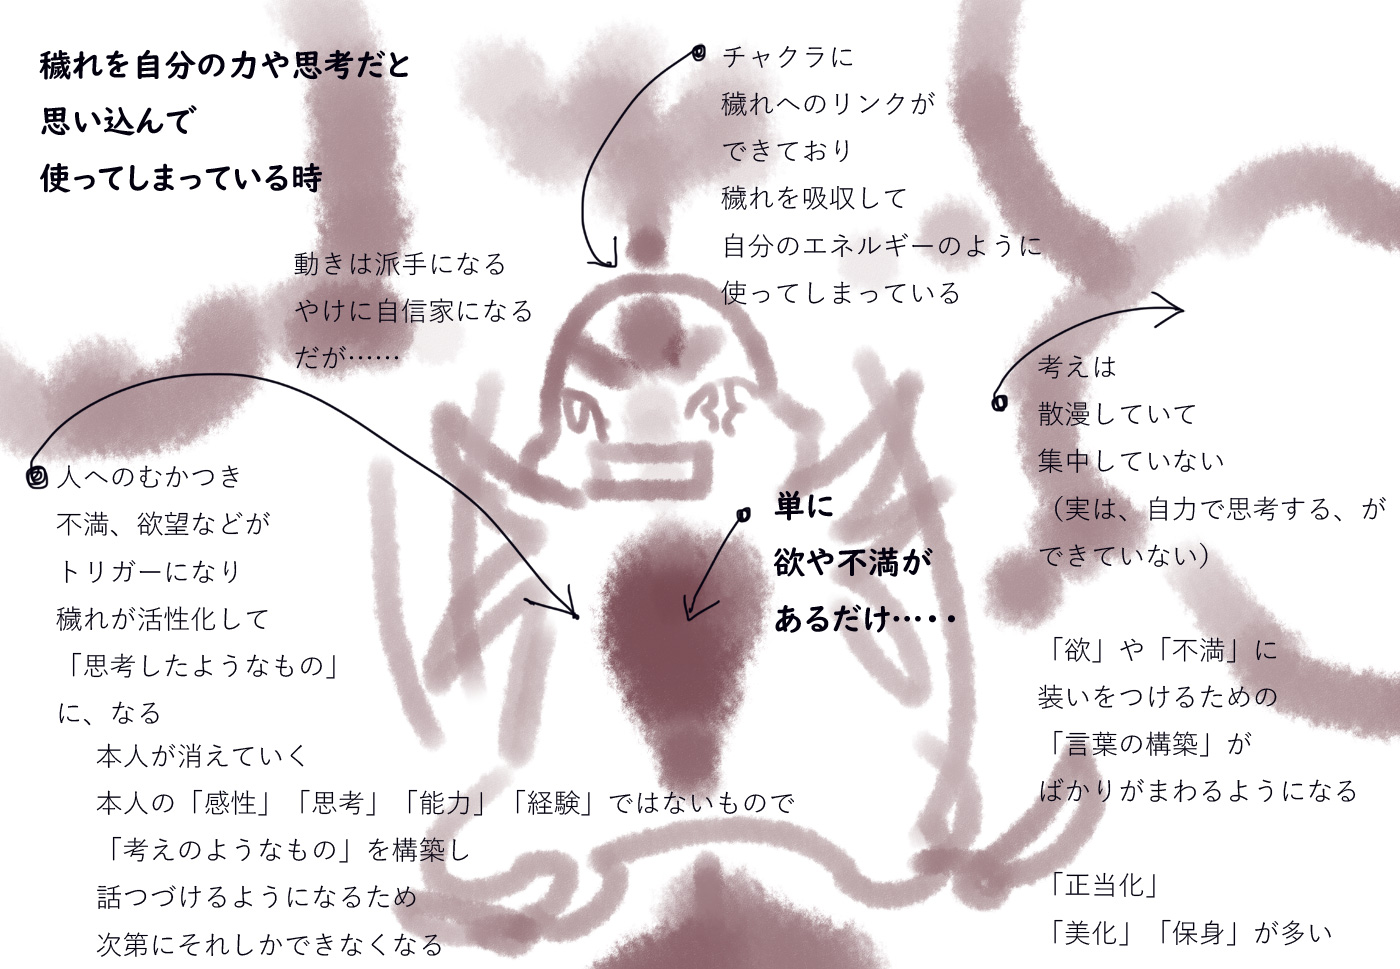 http://ahito.com/comic/ehon/kamiuta/img//2018/20180310/04.jpg